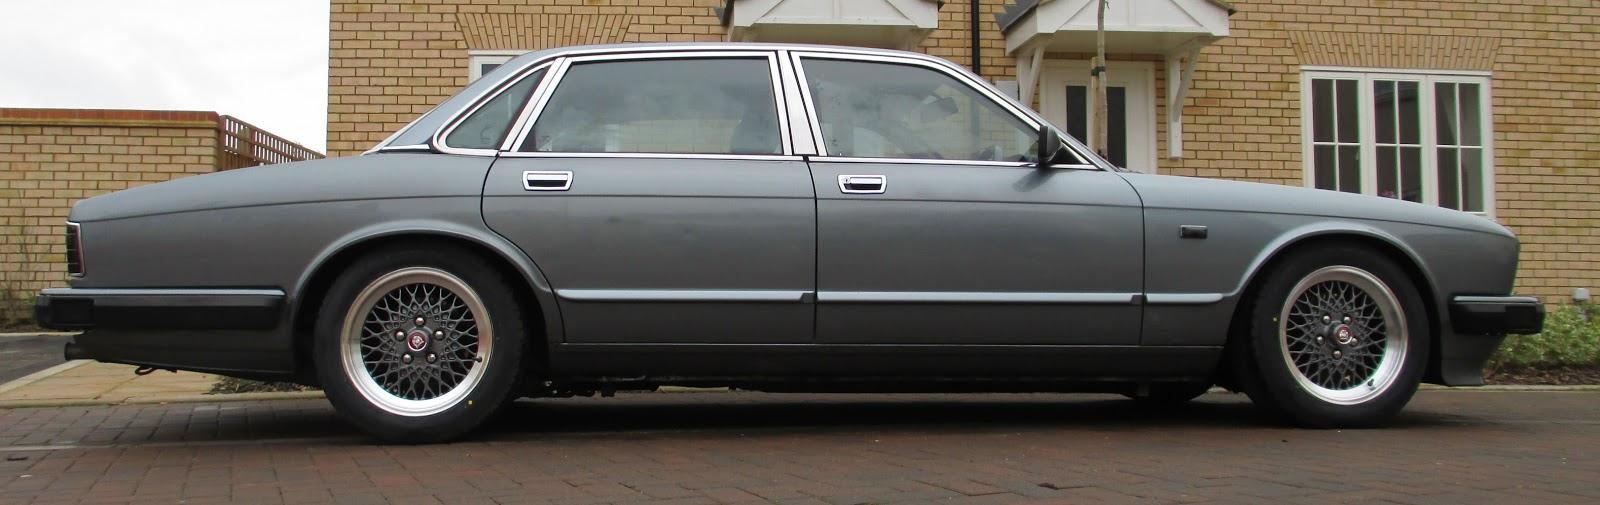 wheels xj s white gallery vehicle xjl rims forged black savini jaguar